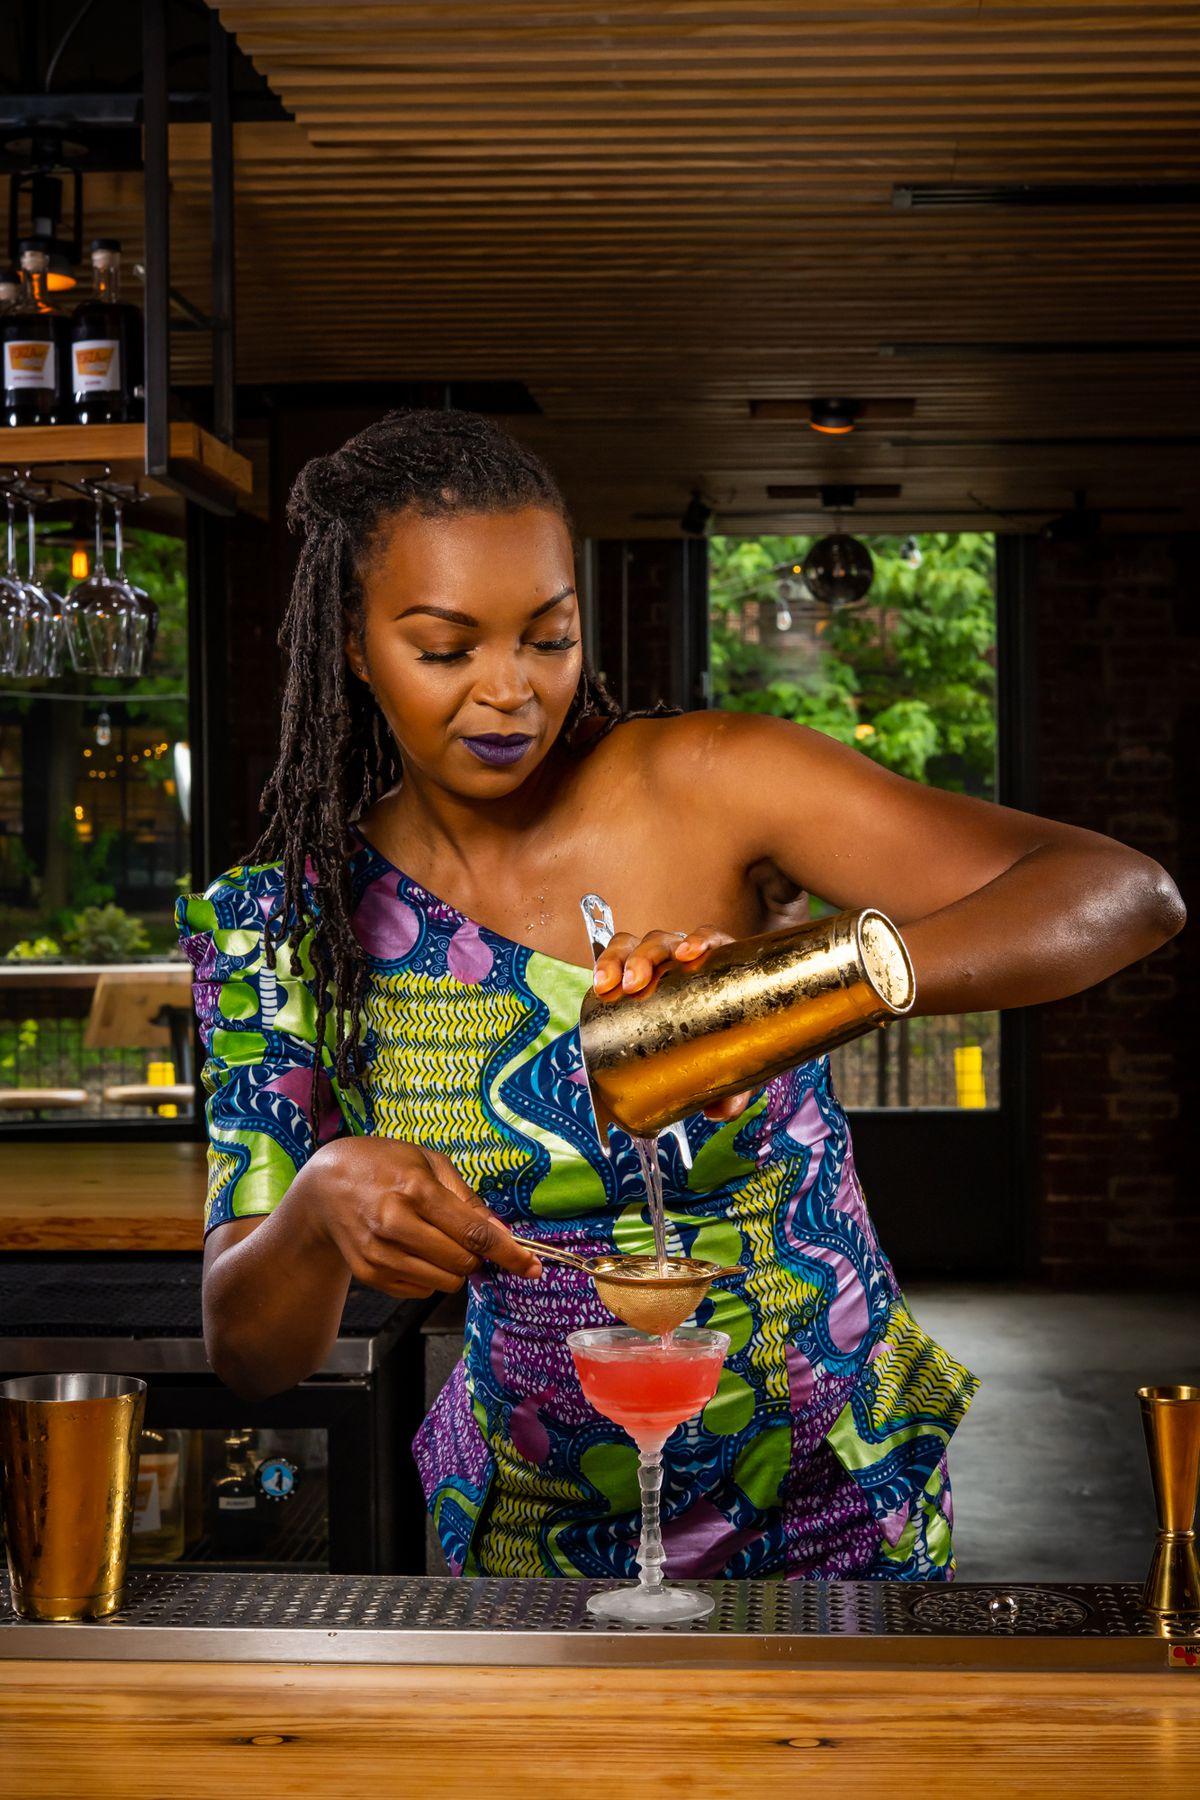 Bartender and A Sip in Paradise Garden founder Keyatta Mincey-Parker